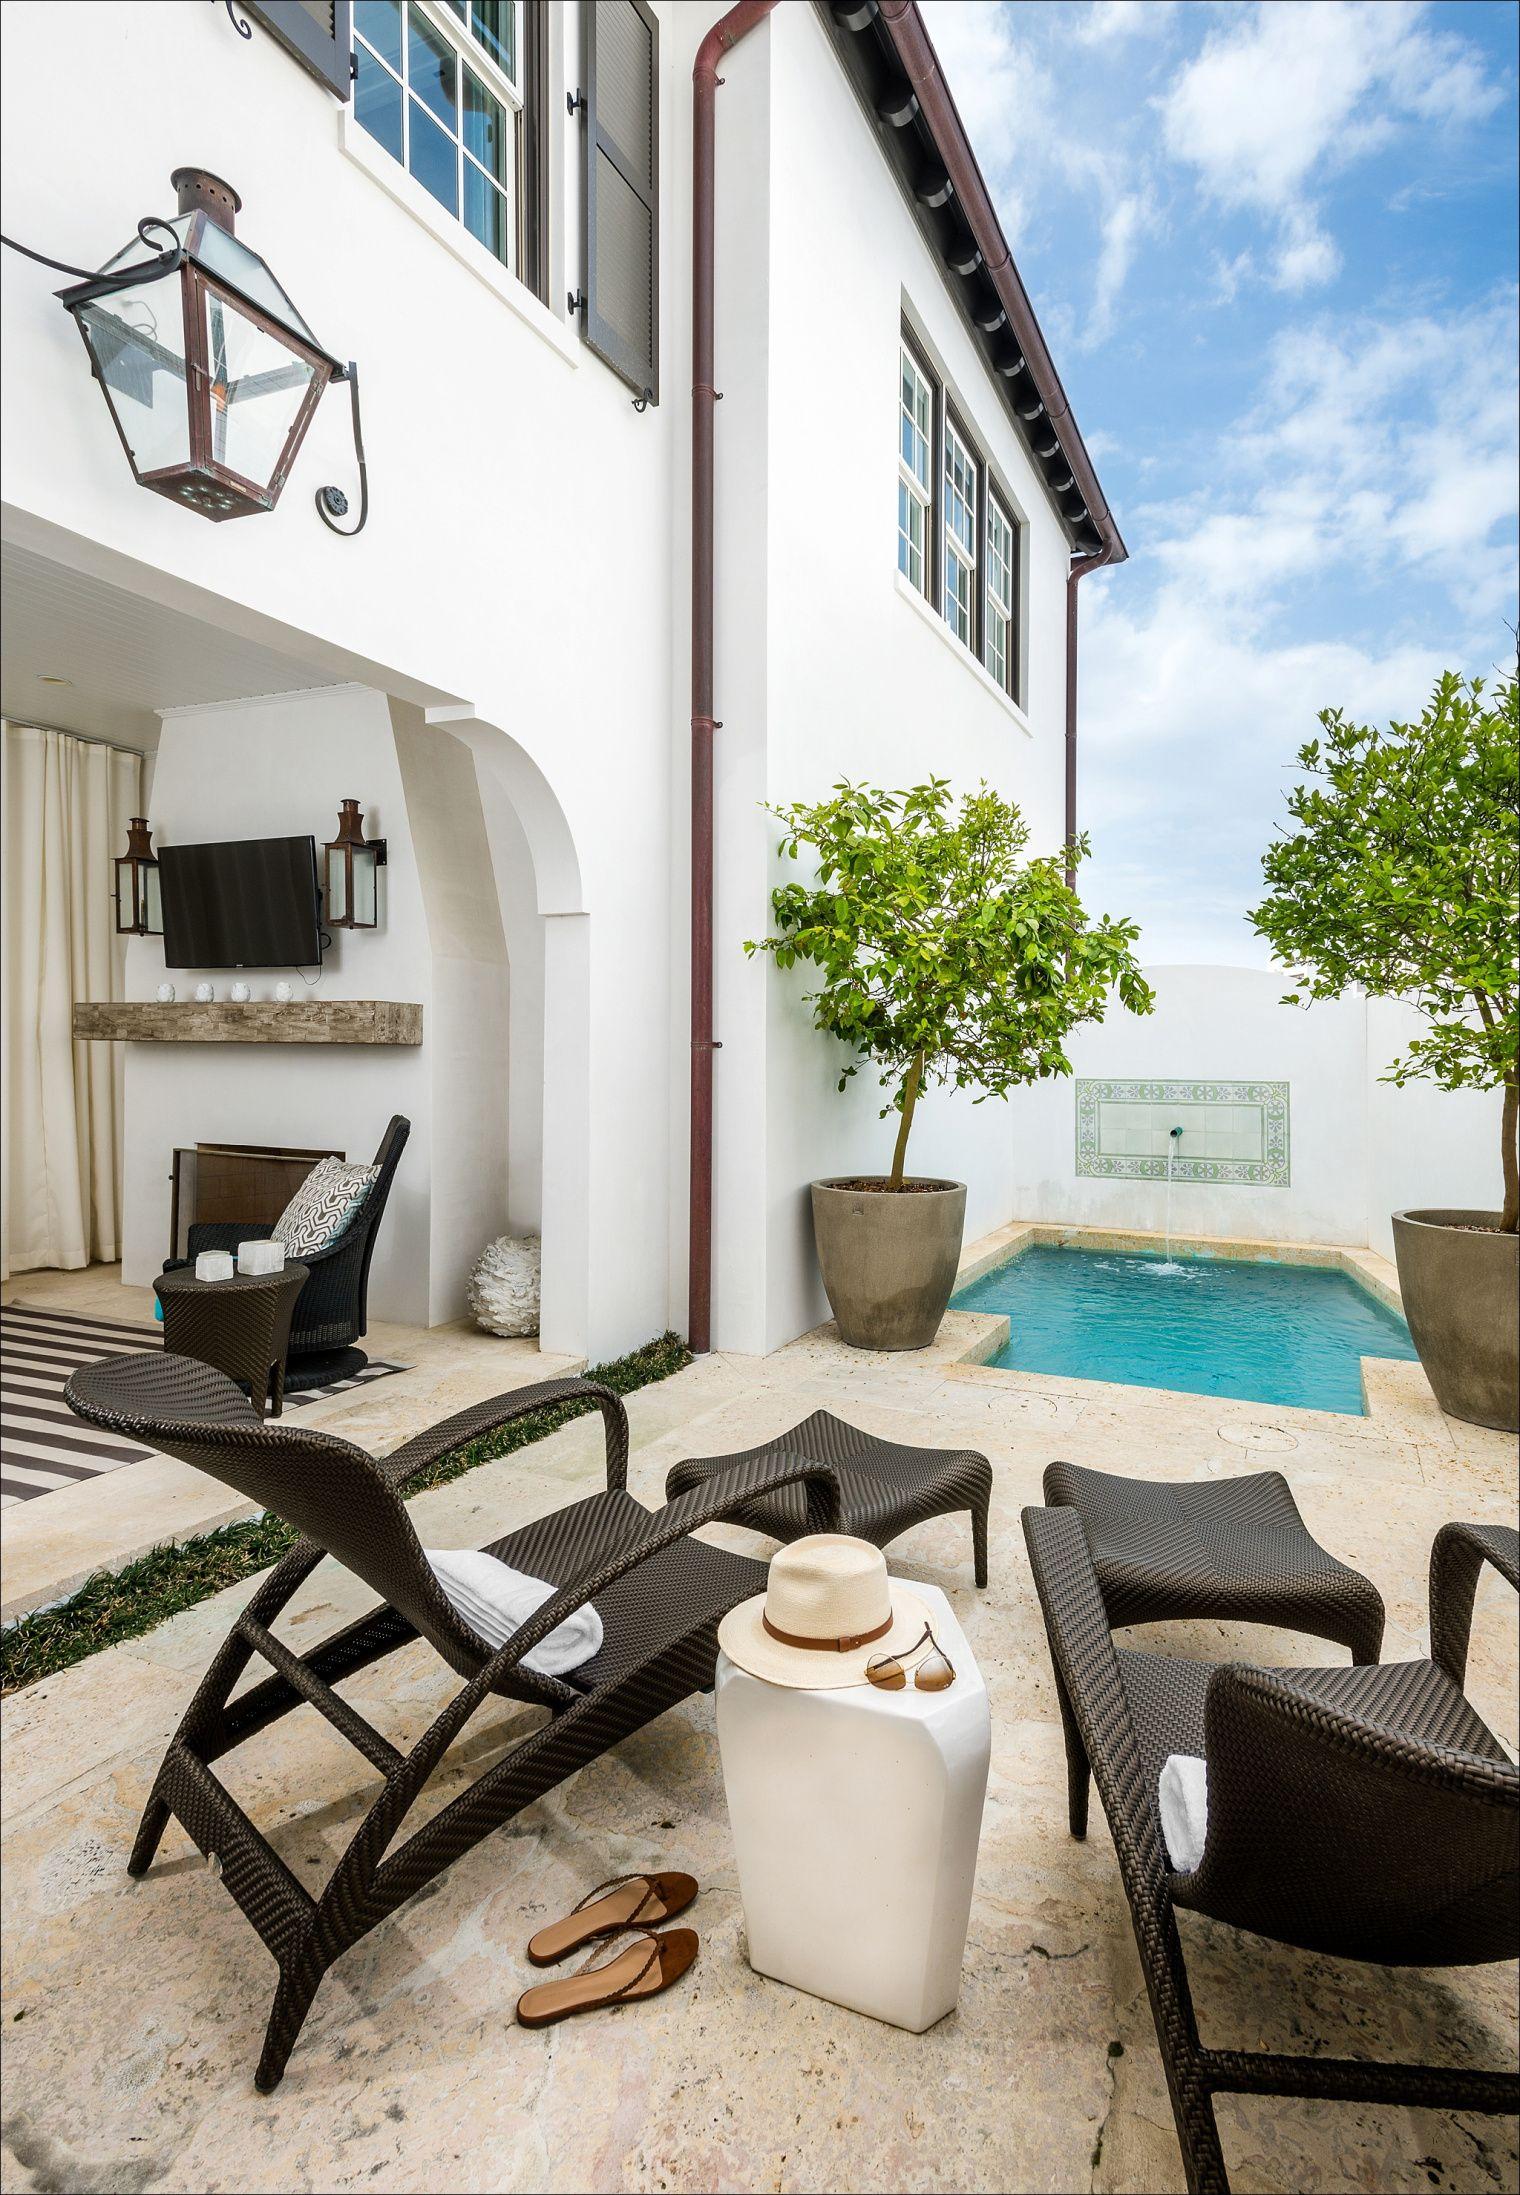 38+ Beach home decor magazines ideas in 2021